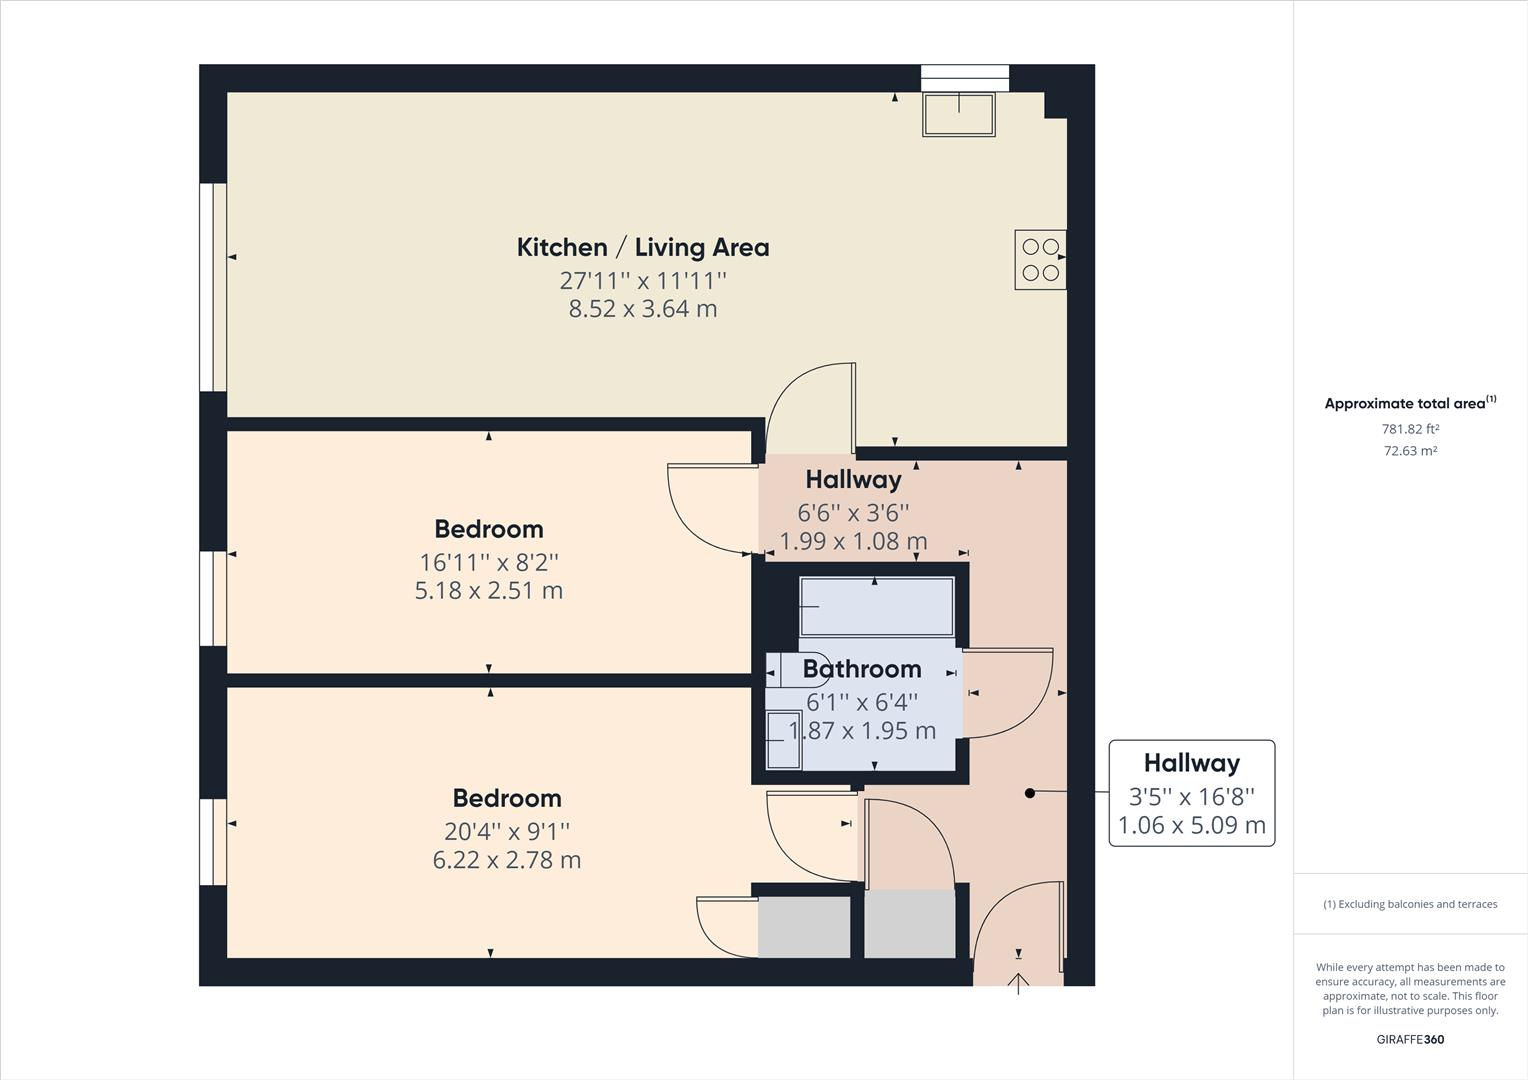 floorplan01_01.png